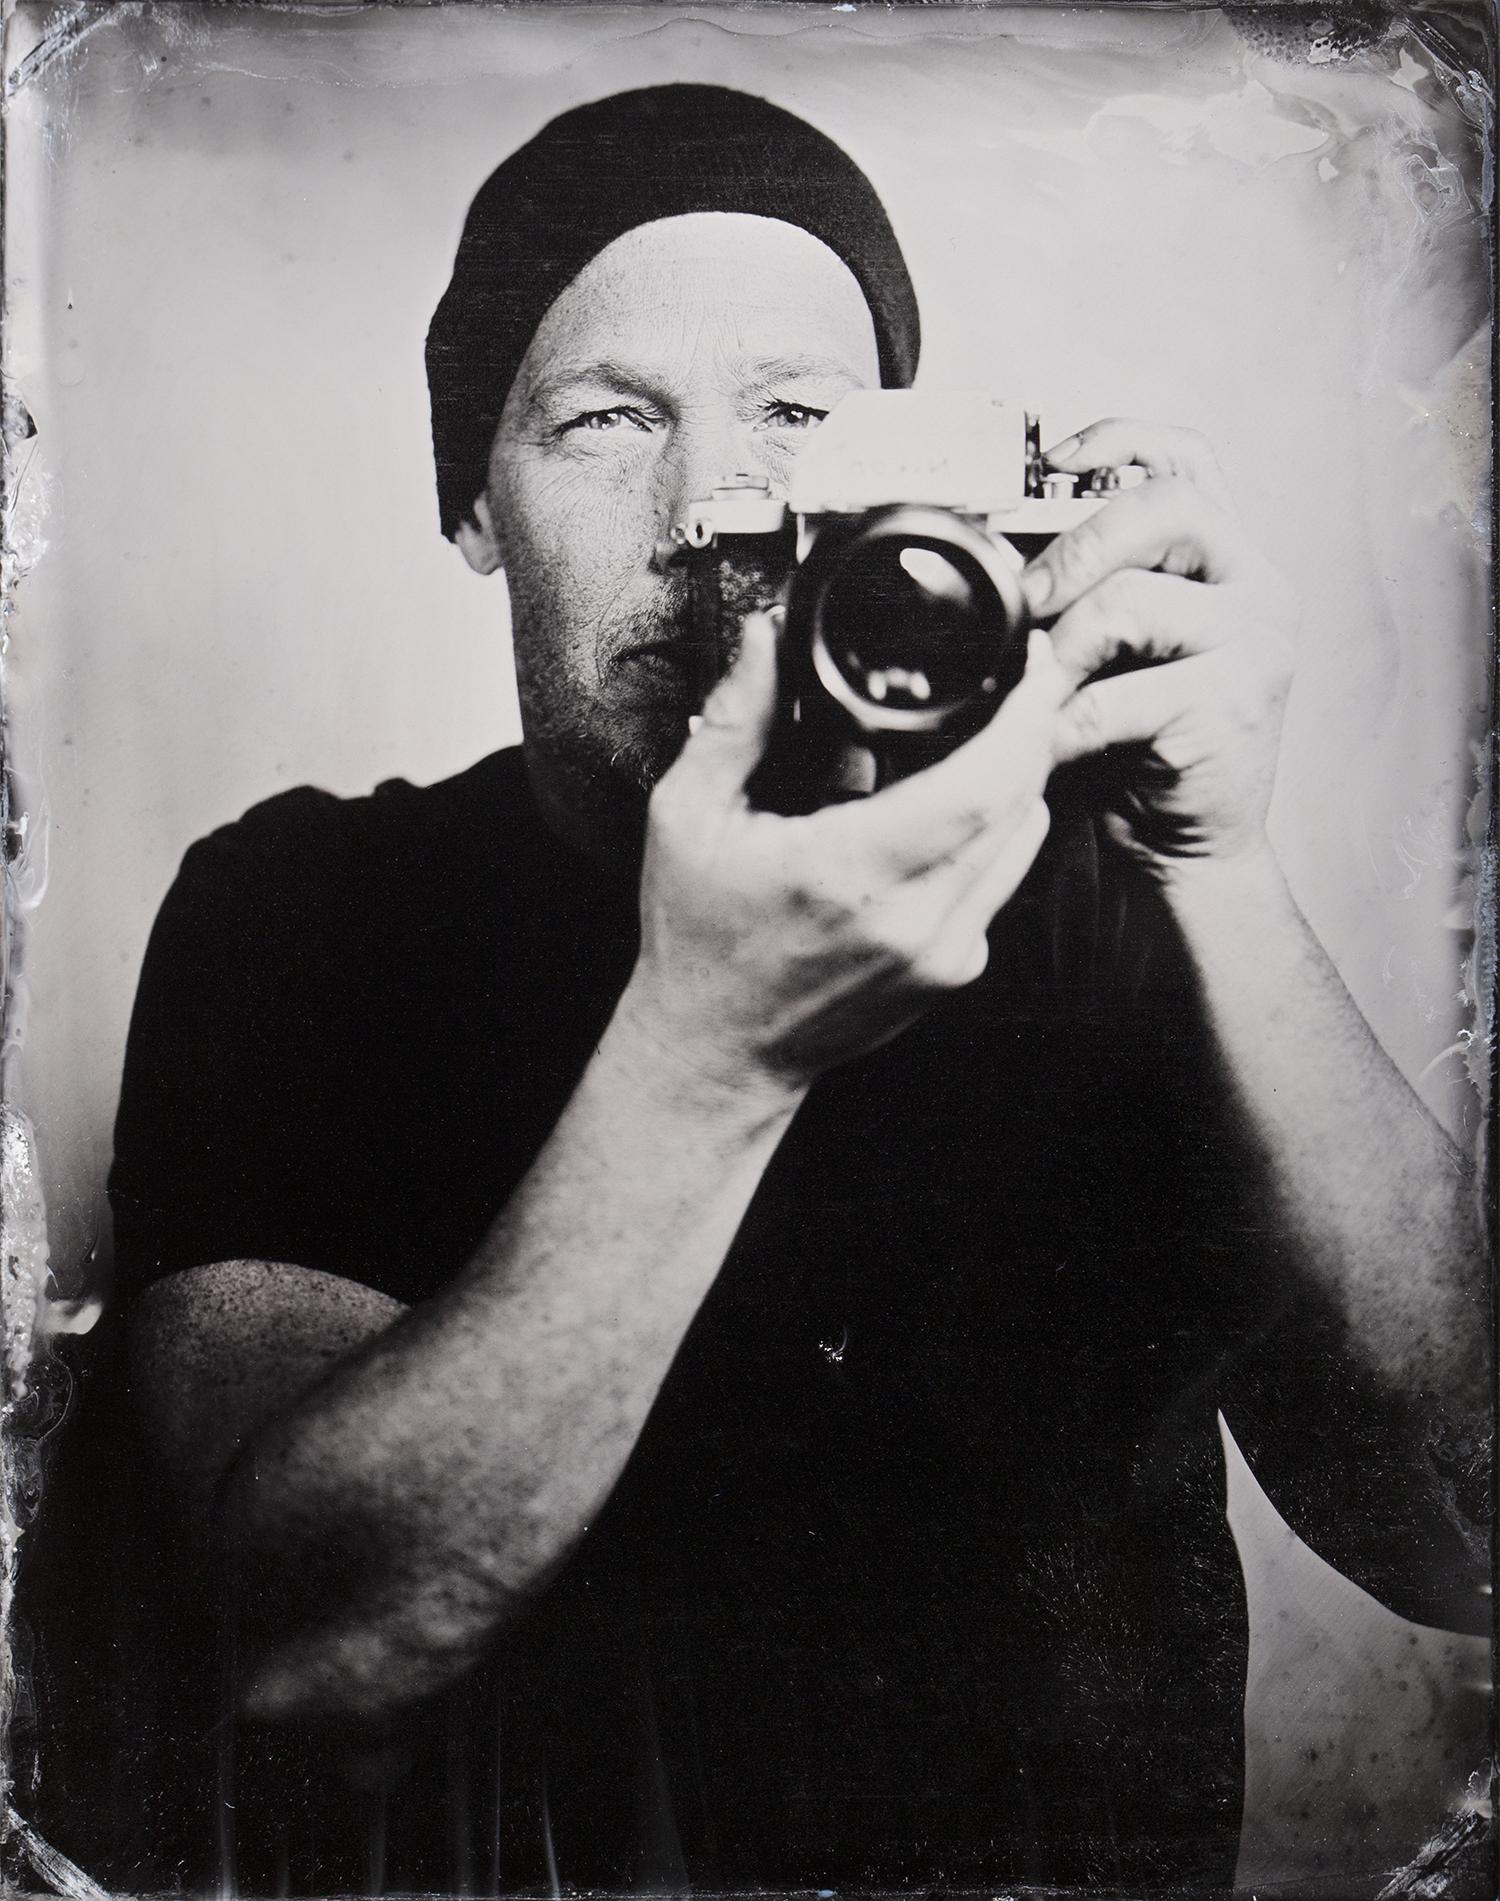 Tin Type , Chris Parsons , Tin Crown Photo , Tin Crown , New York City , Wet Plate Photography , Portraits , Chris Parsons Photography